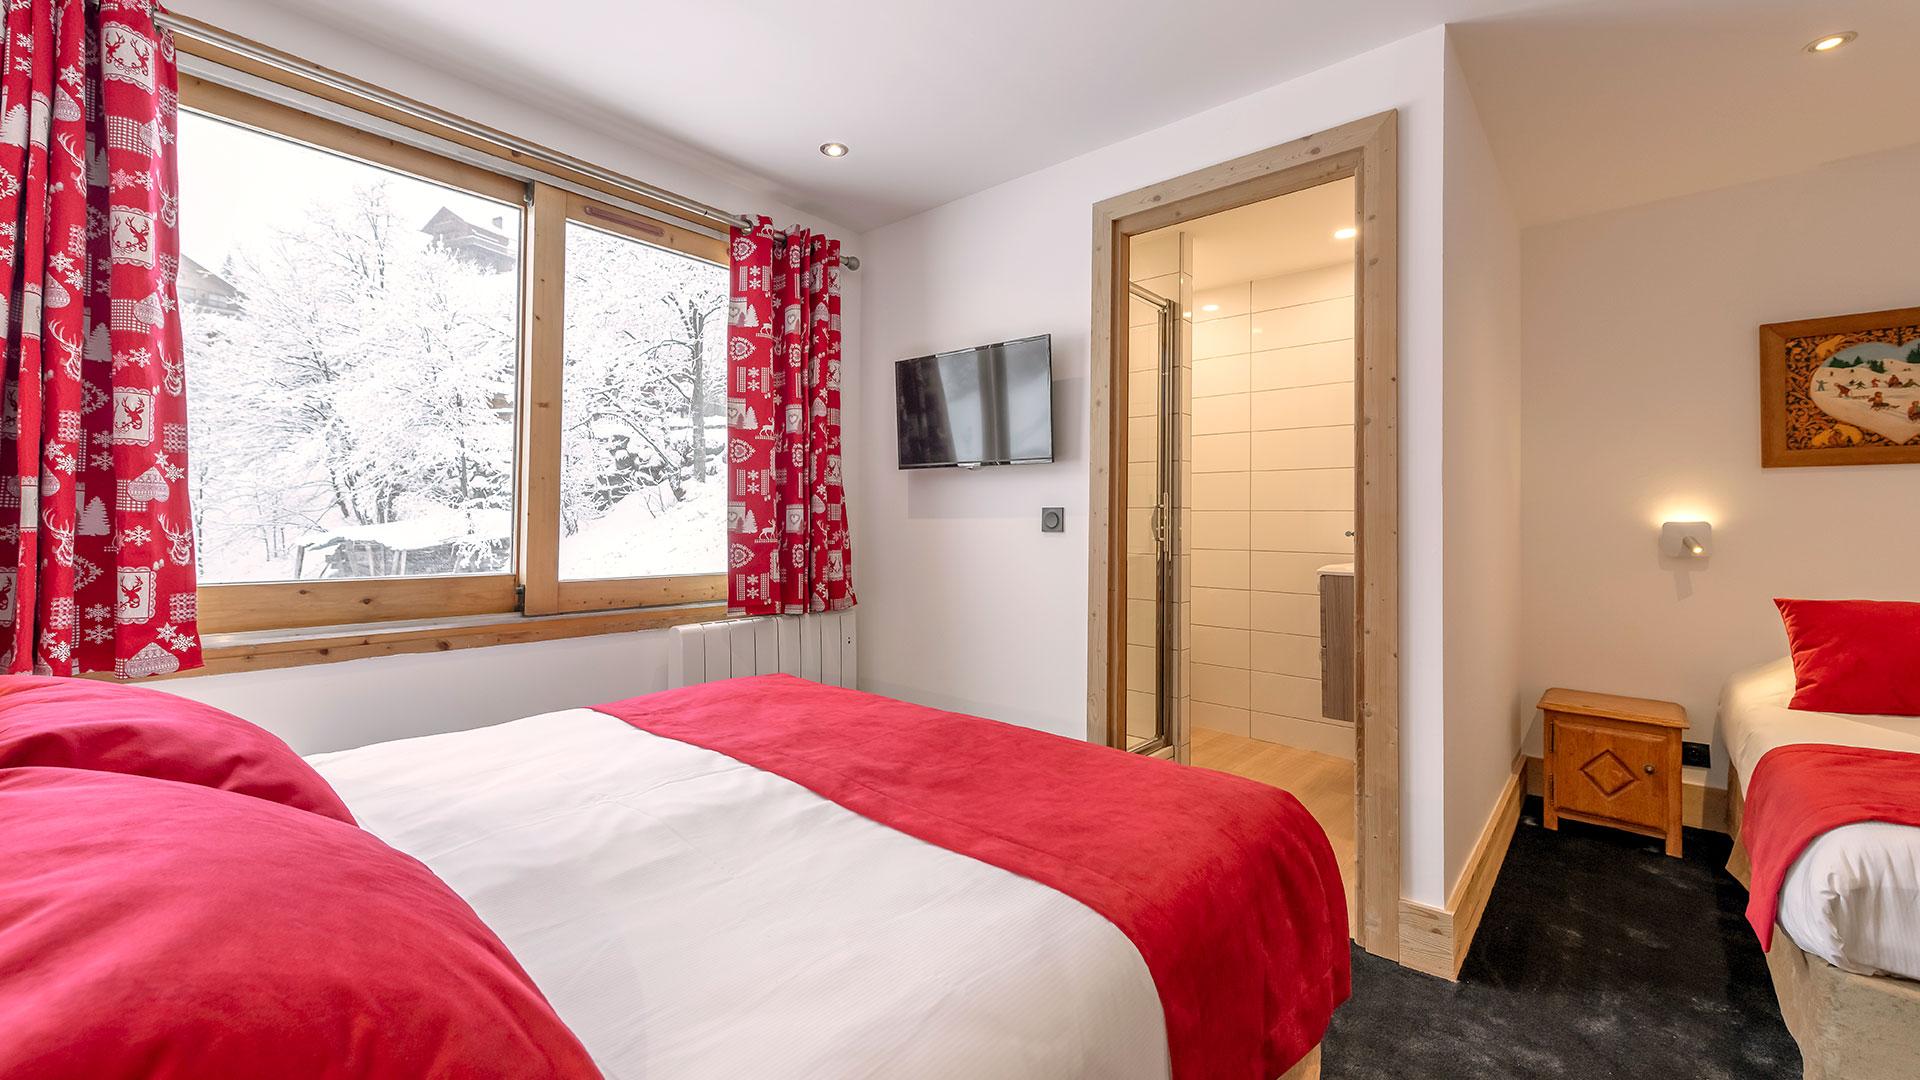 Chambre triple hôtel de charme alpes